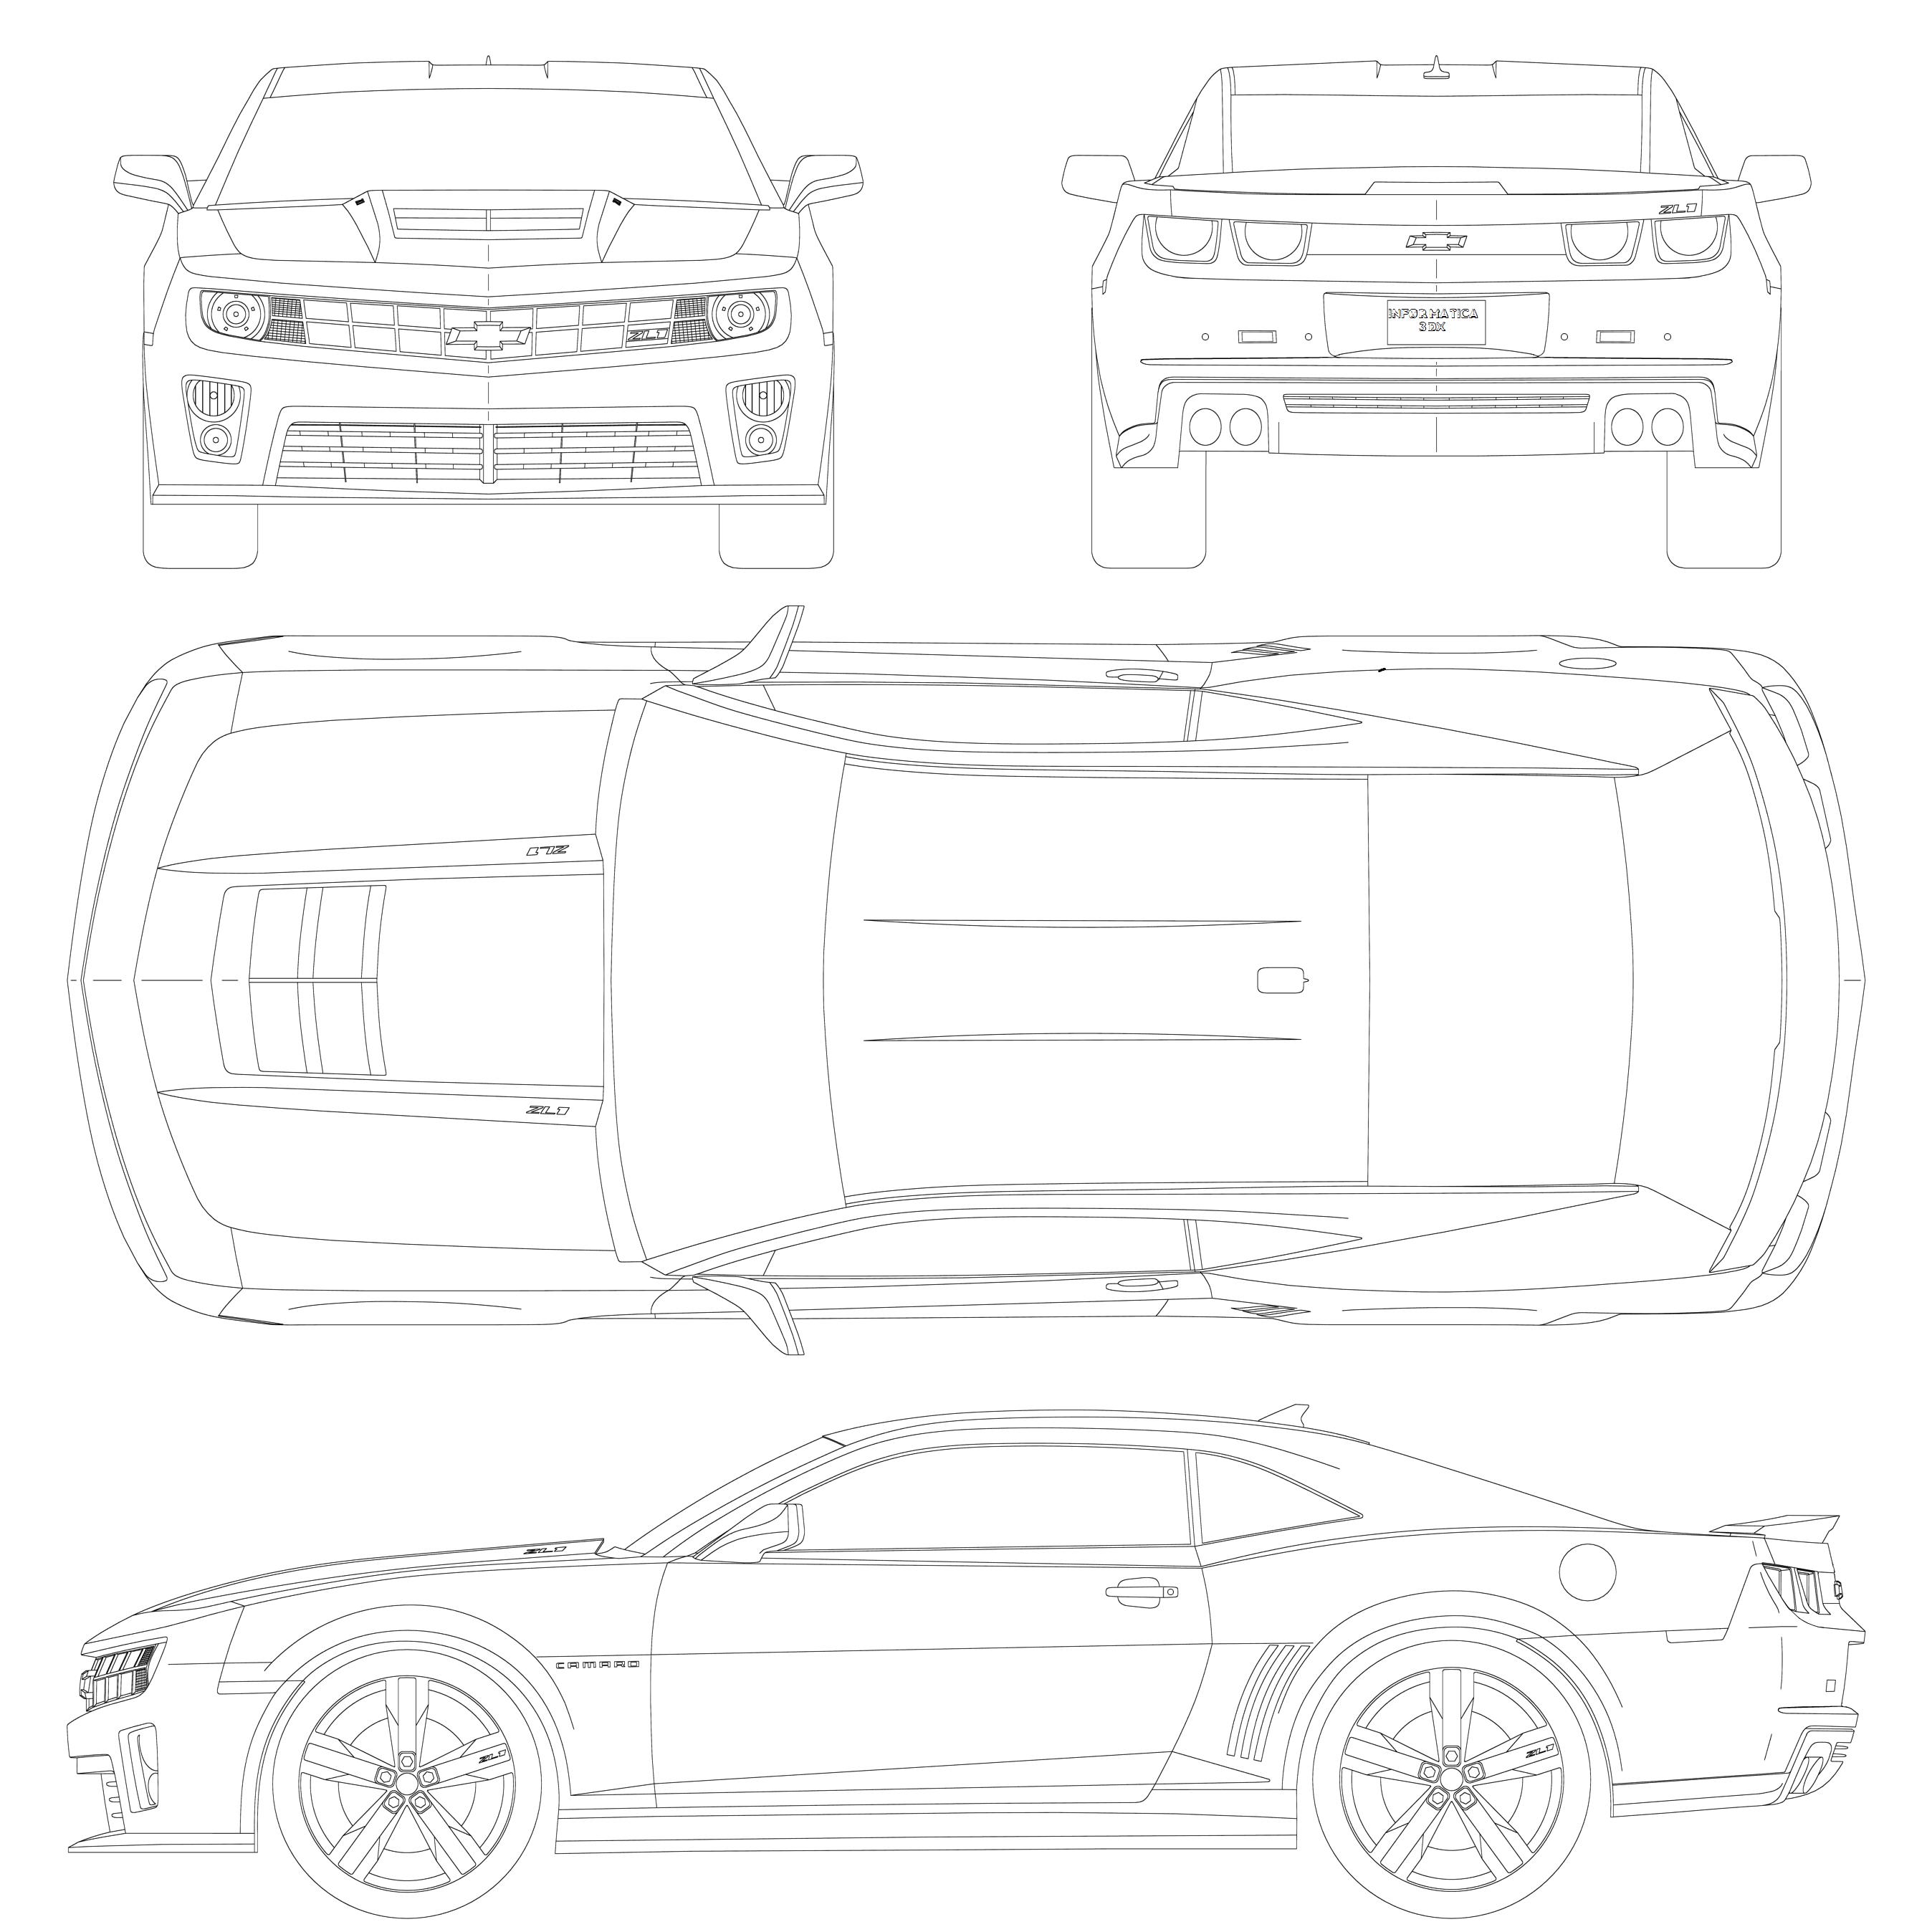 Chevrolet Camaro Zl1 2015 Chevrolet Camaro Zl1 Camaro Zl1